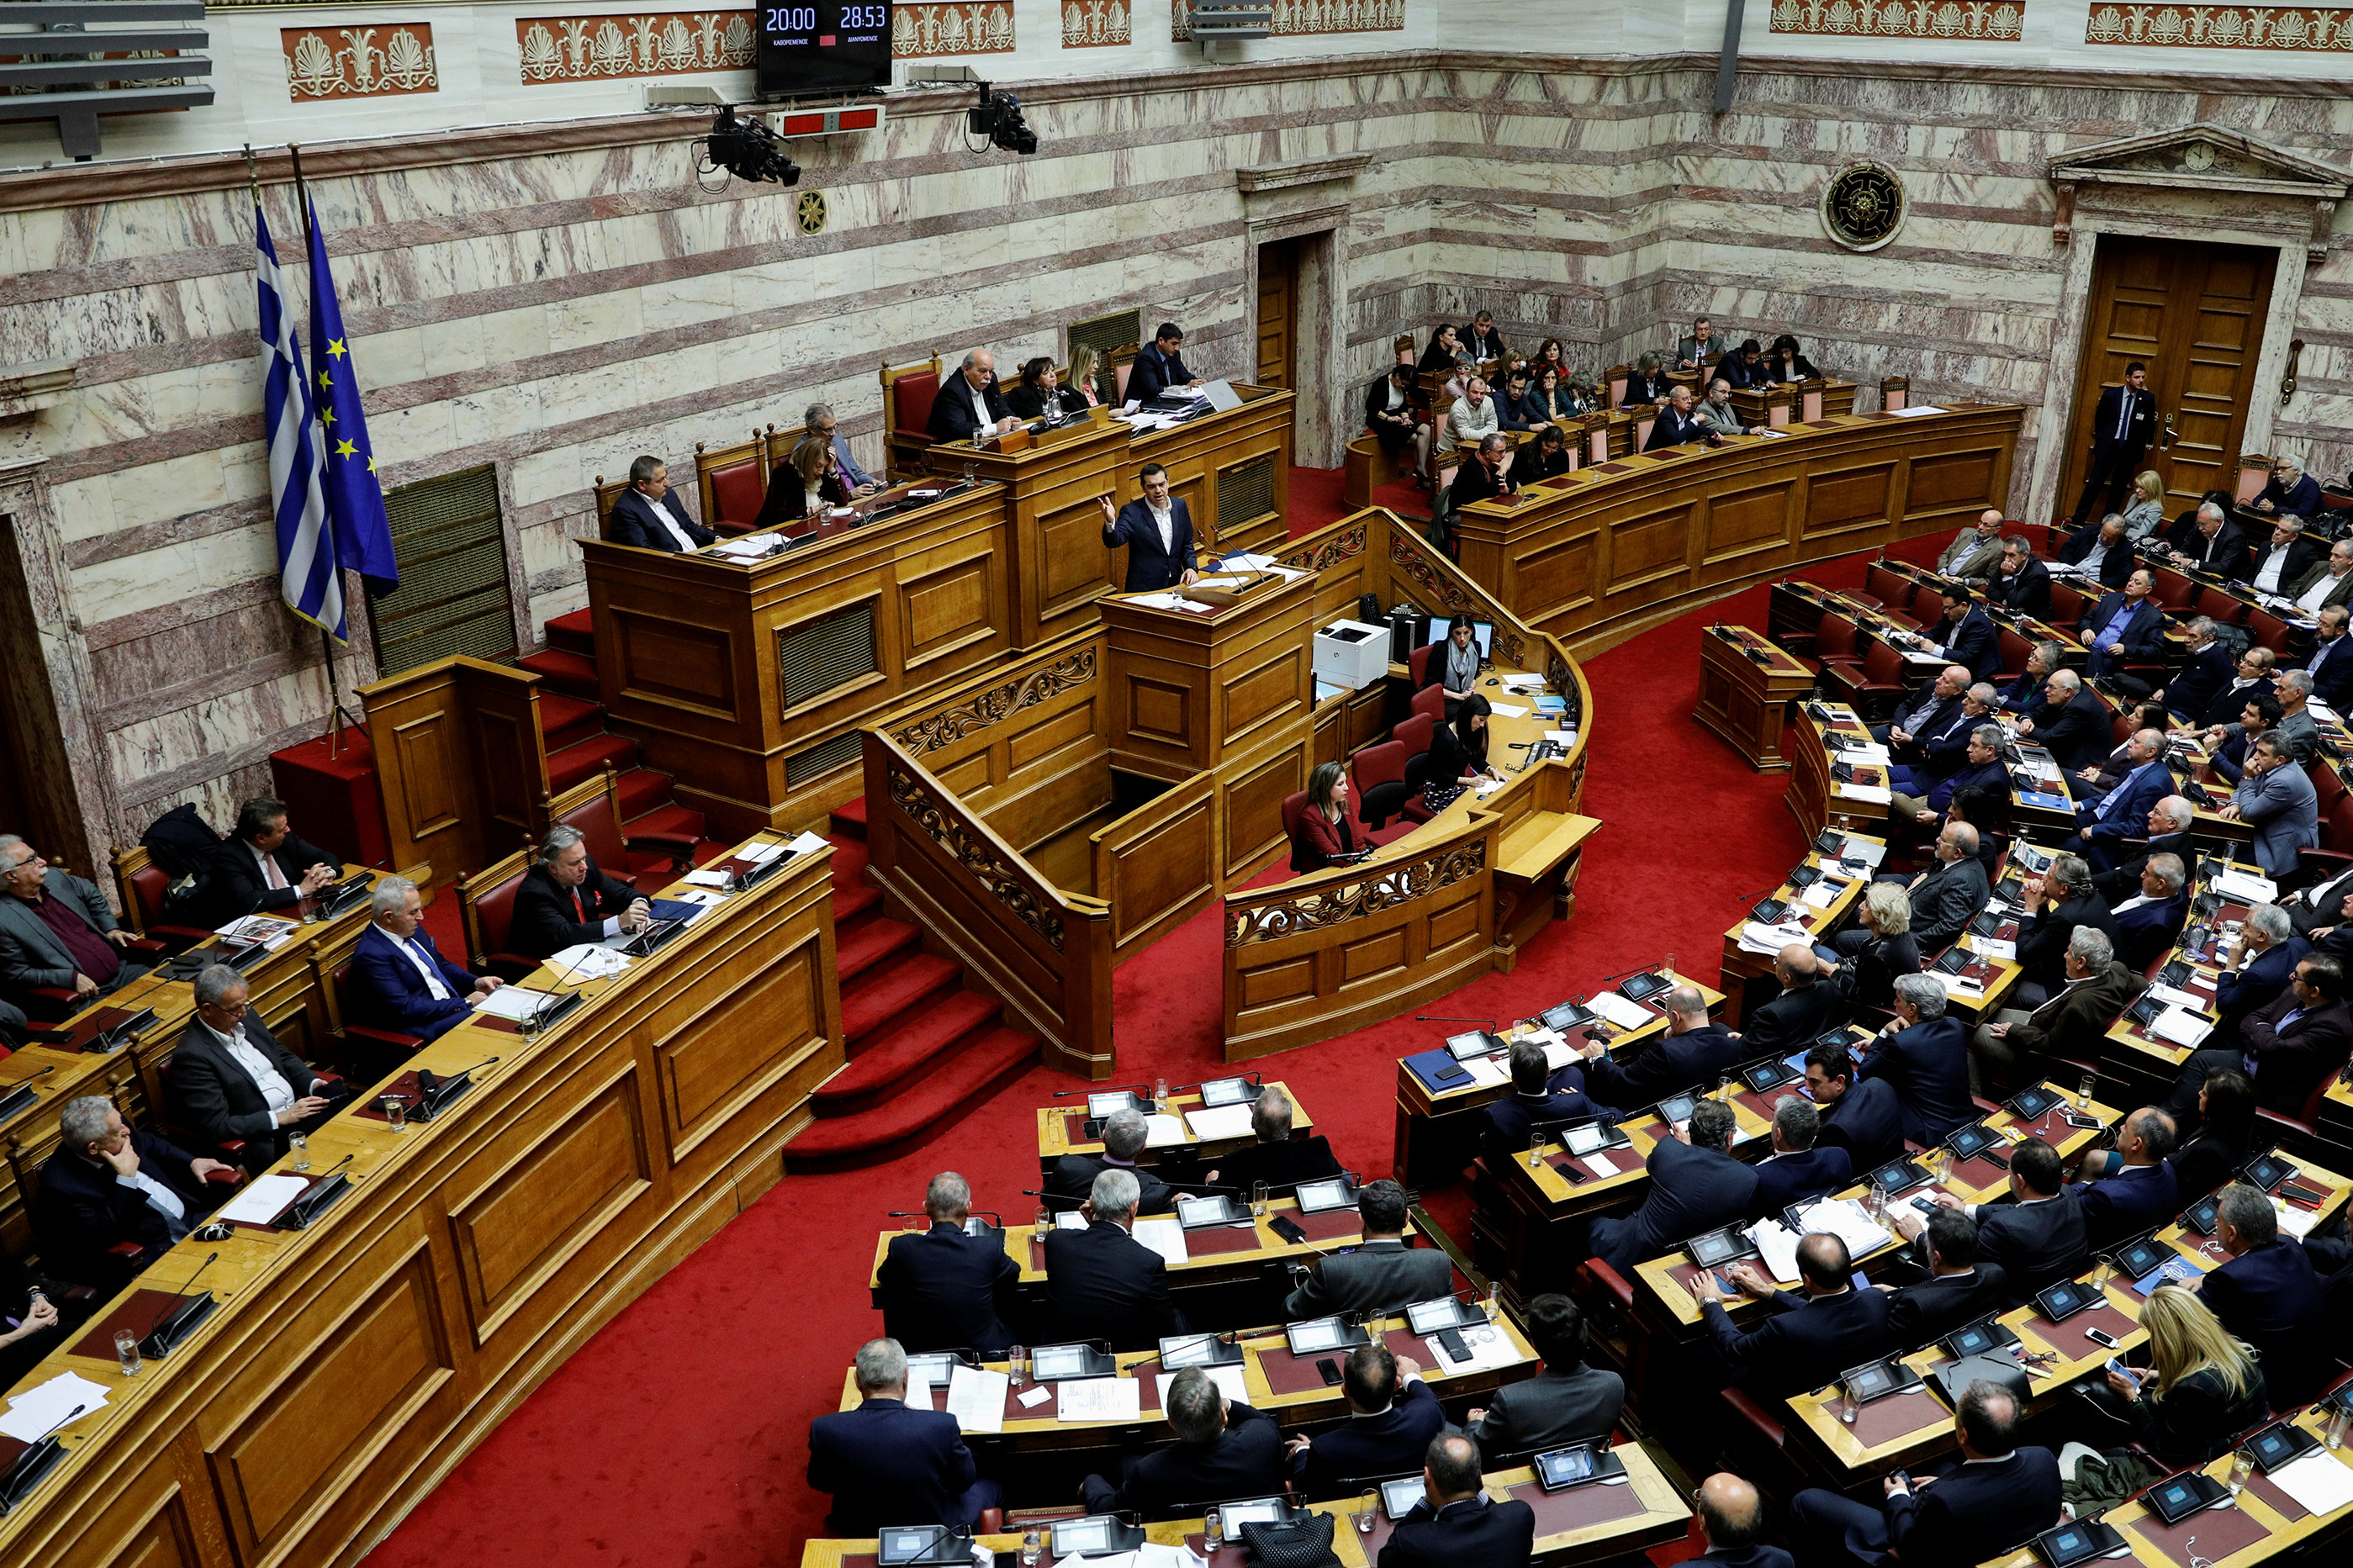 2019-01-24T200828Z_1937618390_RC15780C13D0_RTRMADP_3_GREECE-MACEDONIA-PARLIAMENT-VOTE